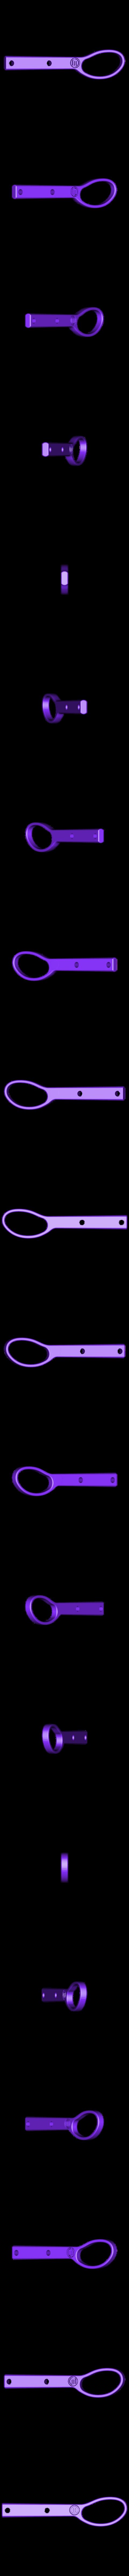 Scissor_handle2withM_dmdf.stl Download free OBJ file Scissor Hands • 3D printable design, Nairobiguy3D